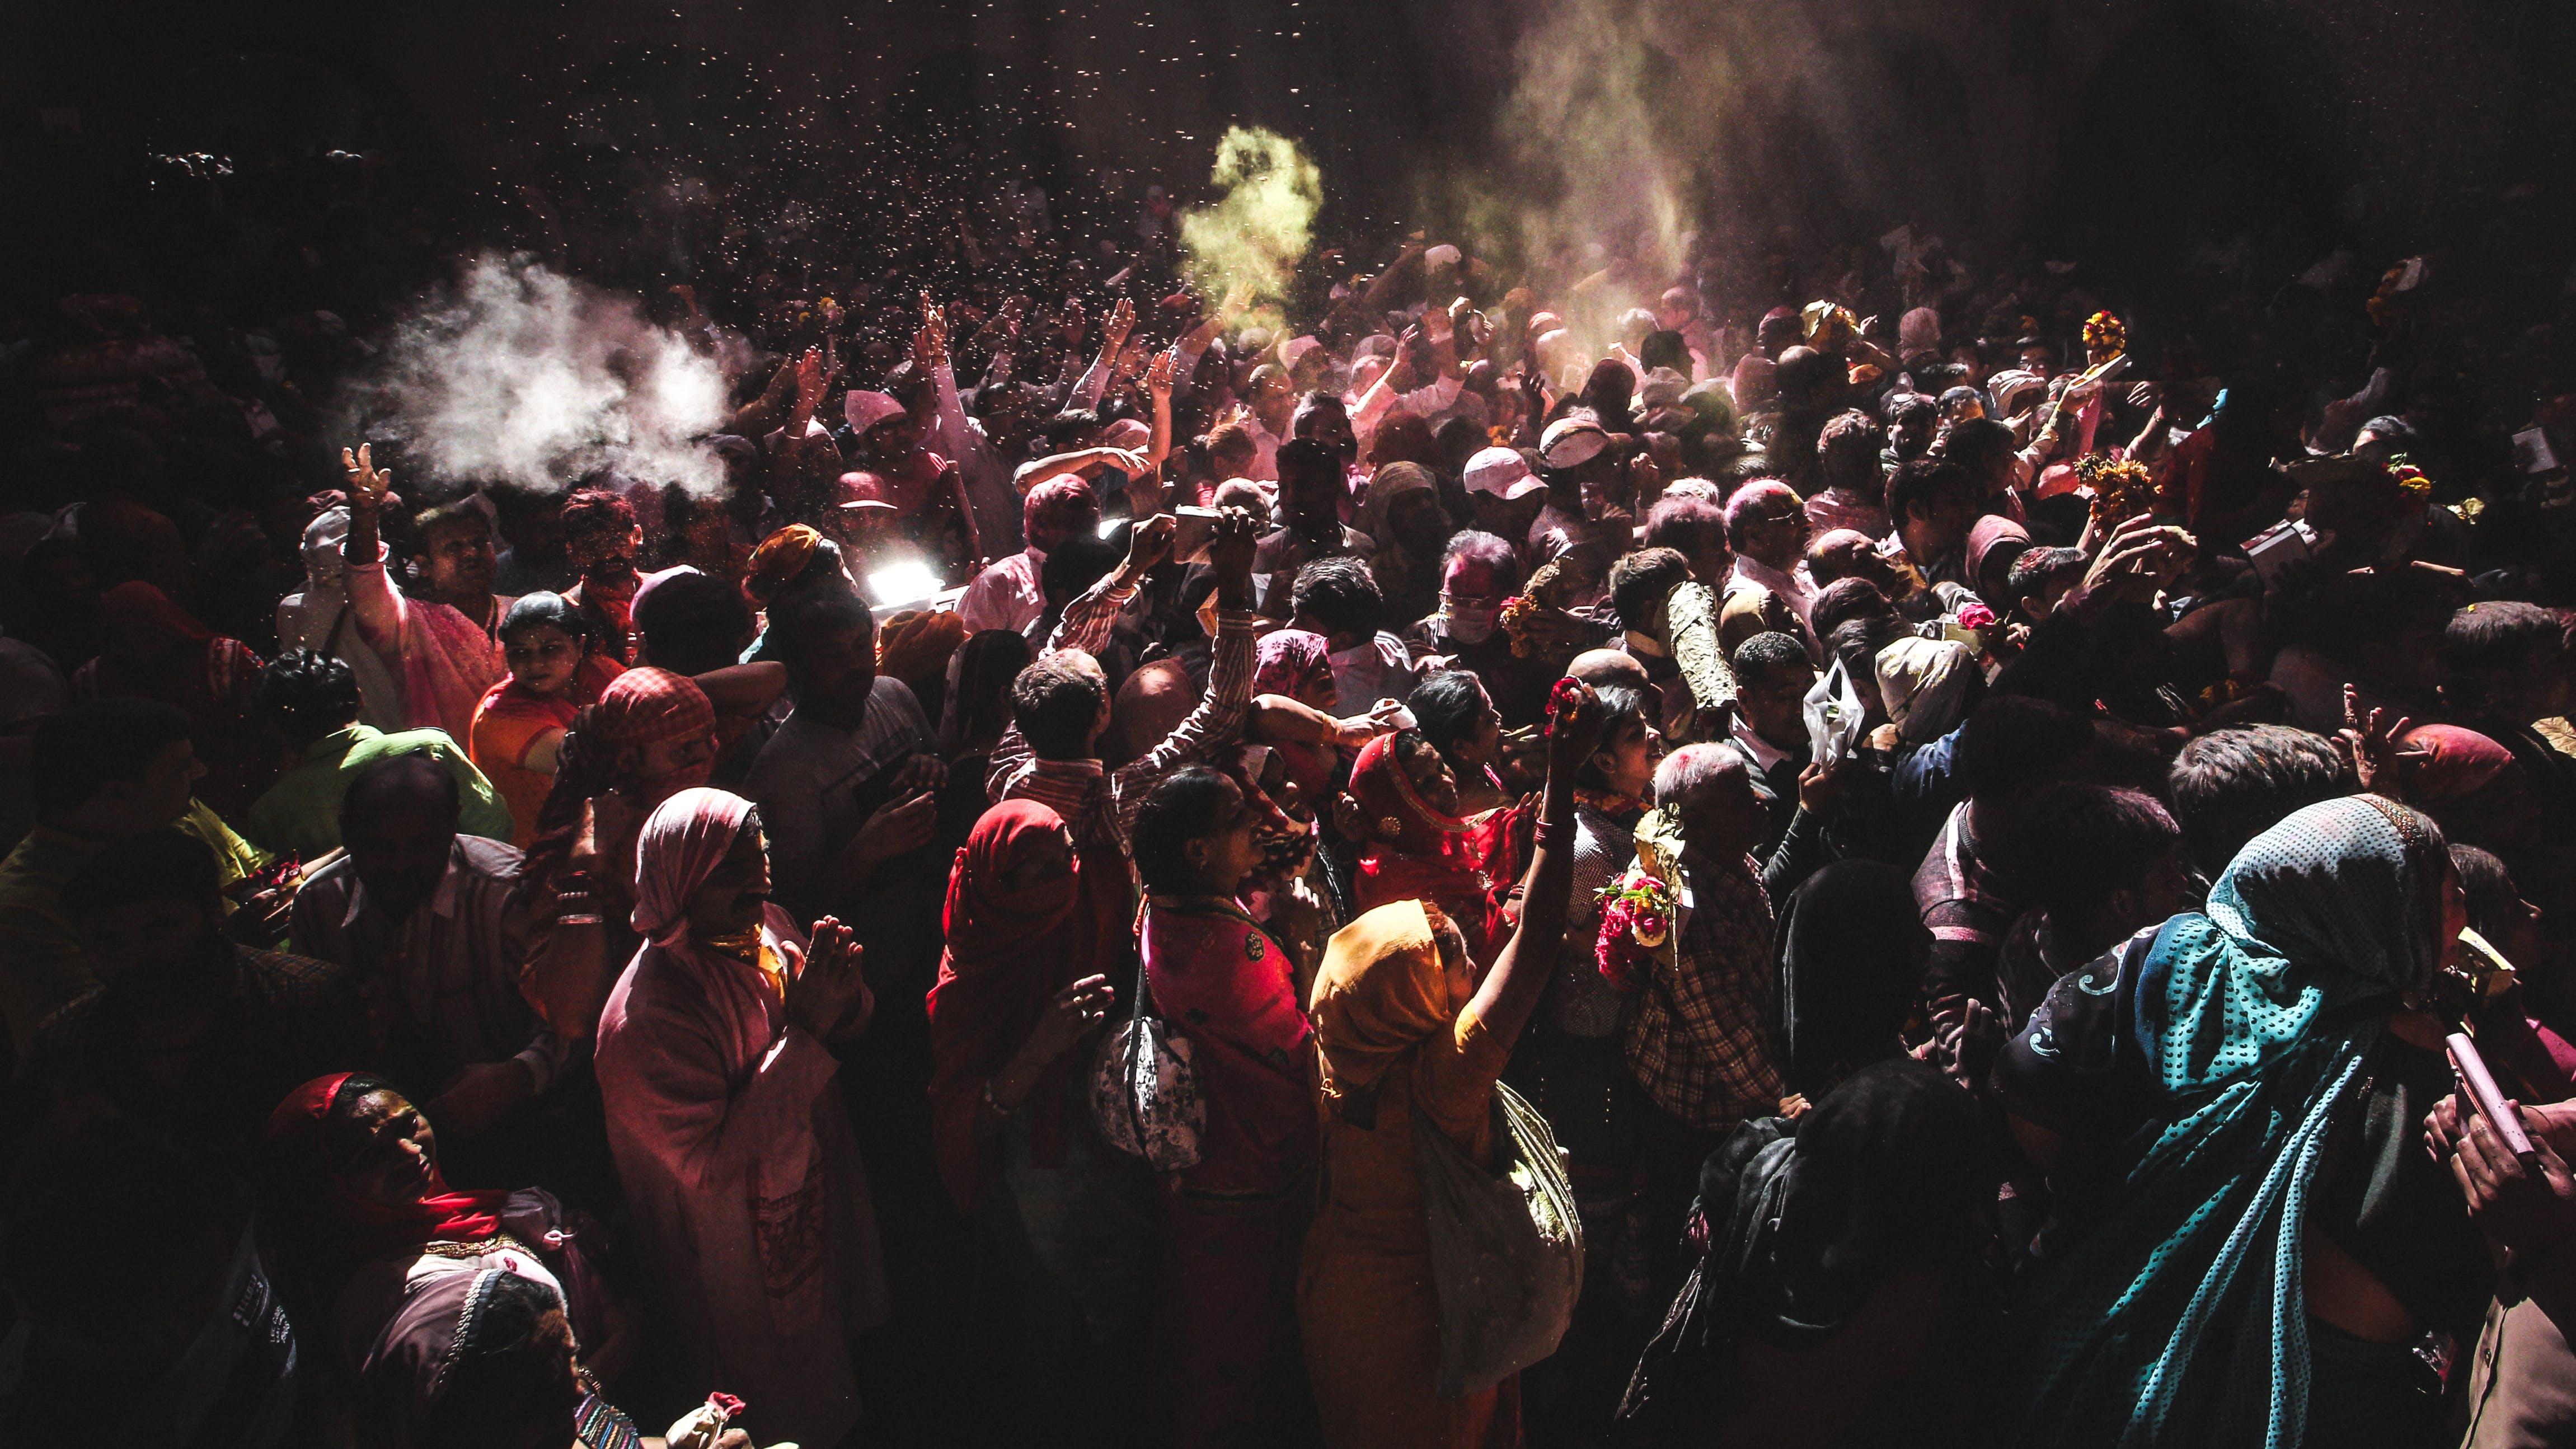 People in Holi Festival